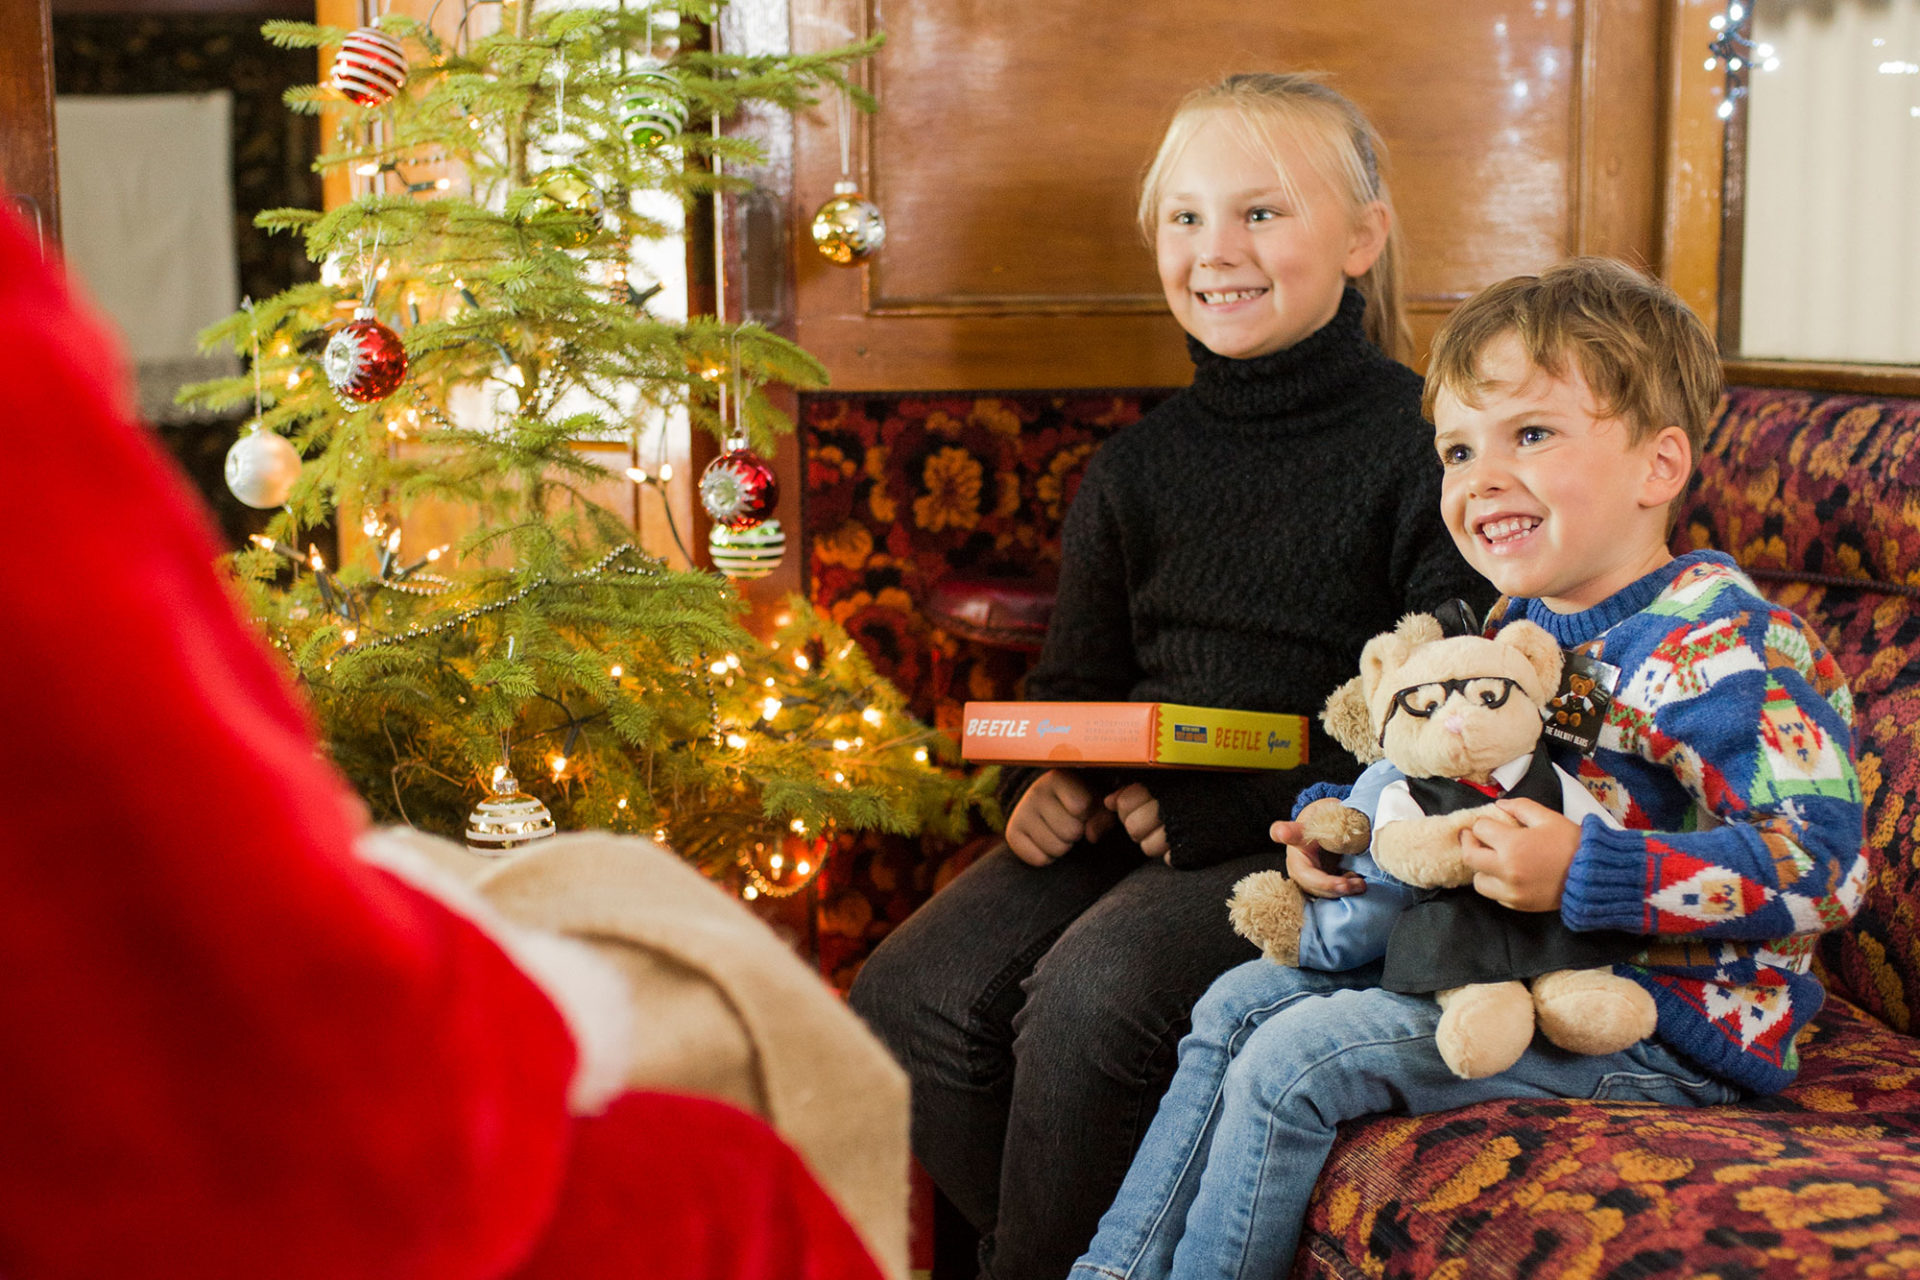 Children meeting Santa